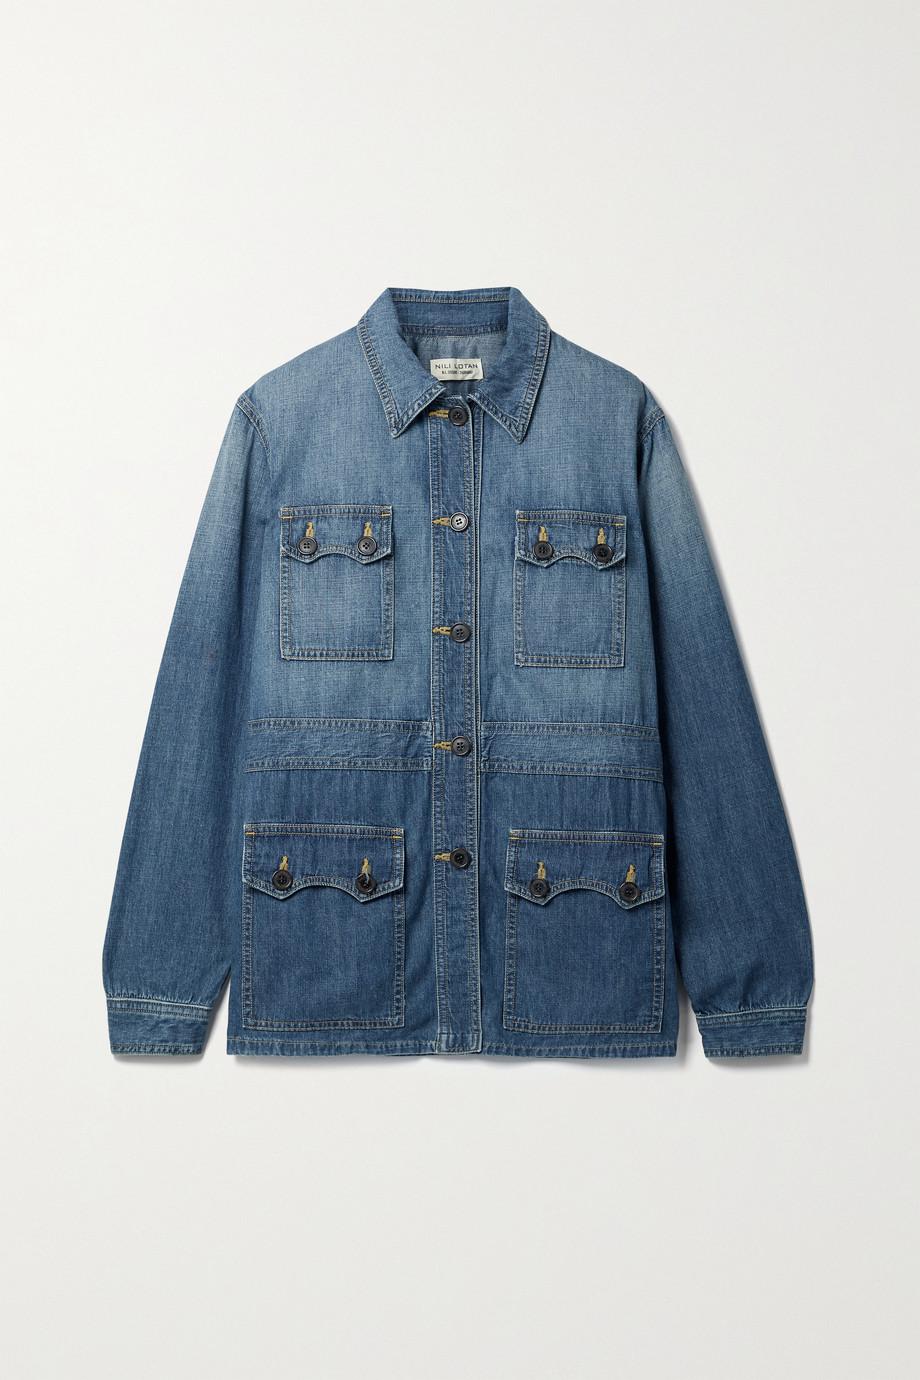 Nili Lotan Blake denim jacket